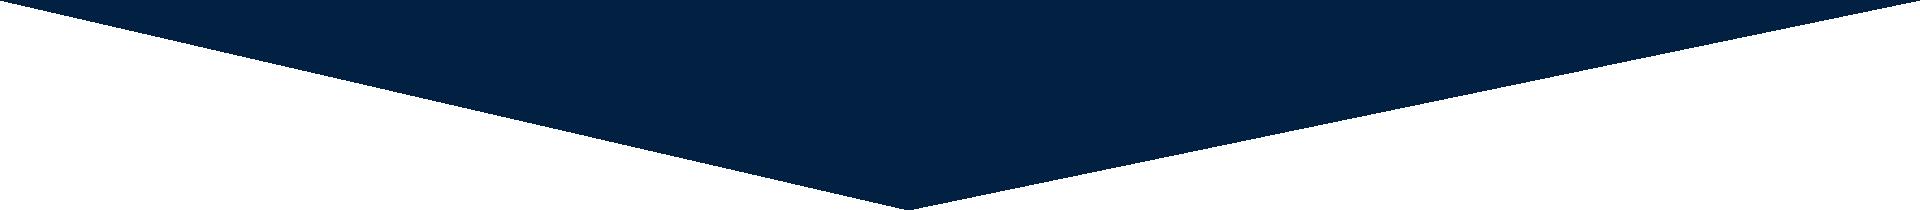 CROSSMARK blue triangle